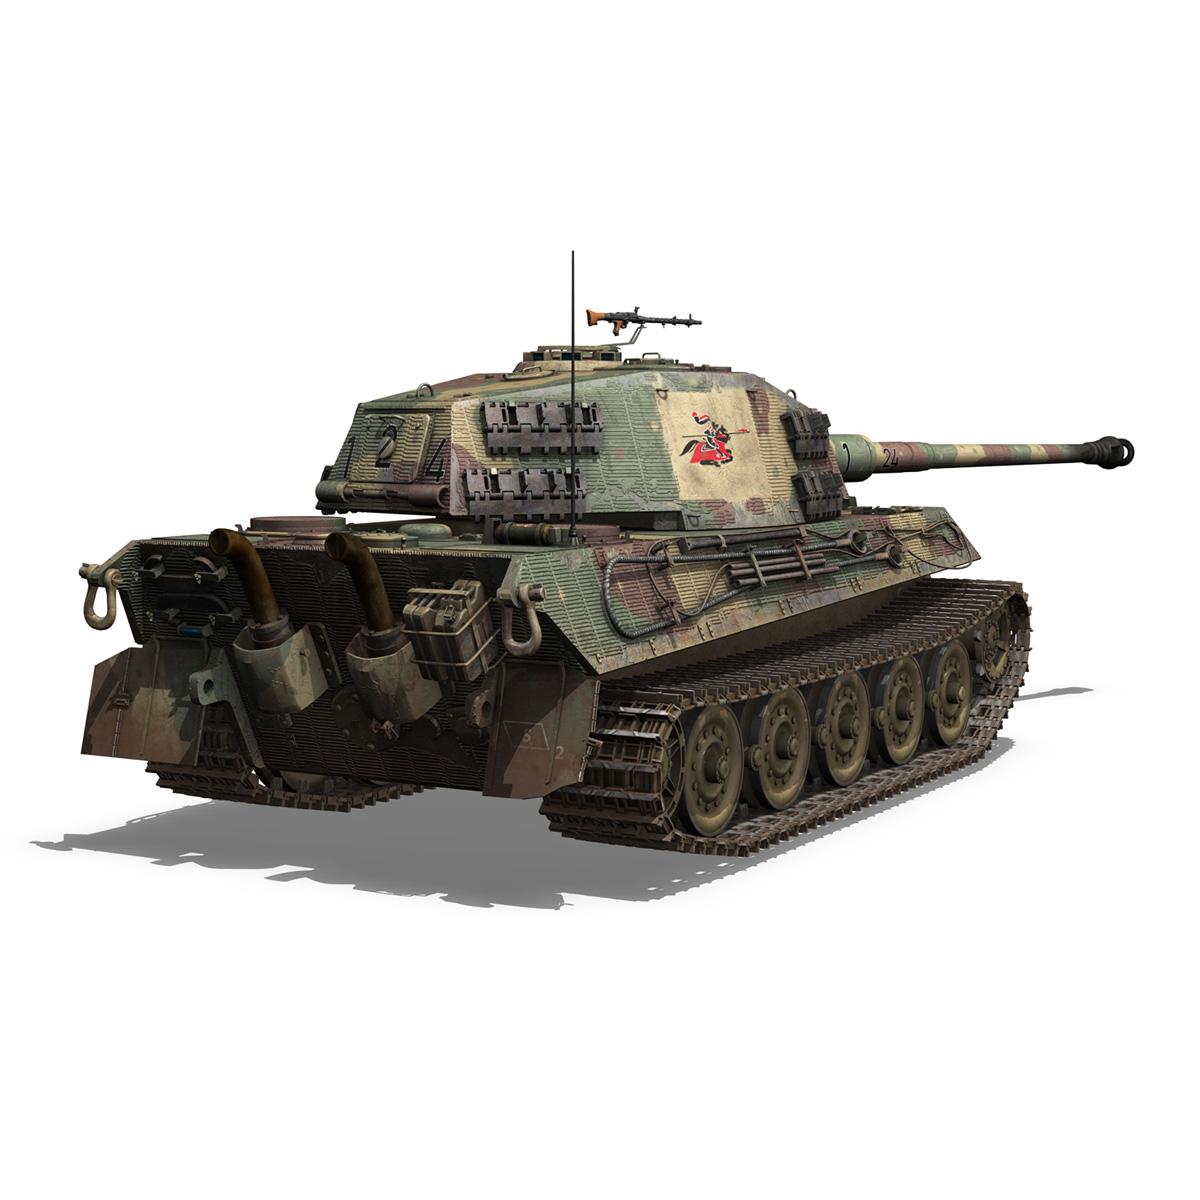 Panzerkampfwagen VI - Ausf B - Tiger II - 124 3d model 3ds c4d lwo lws lw obj 273760